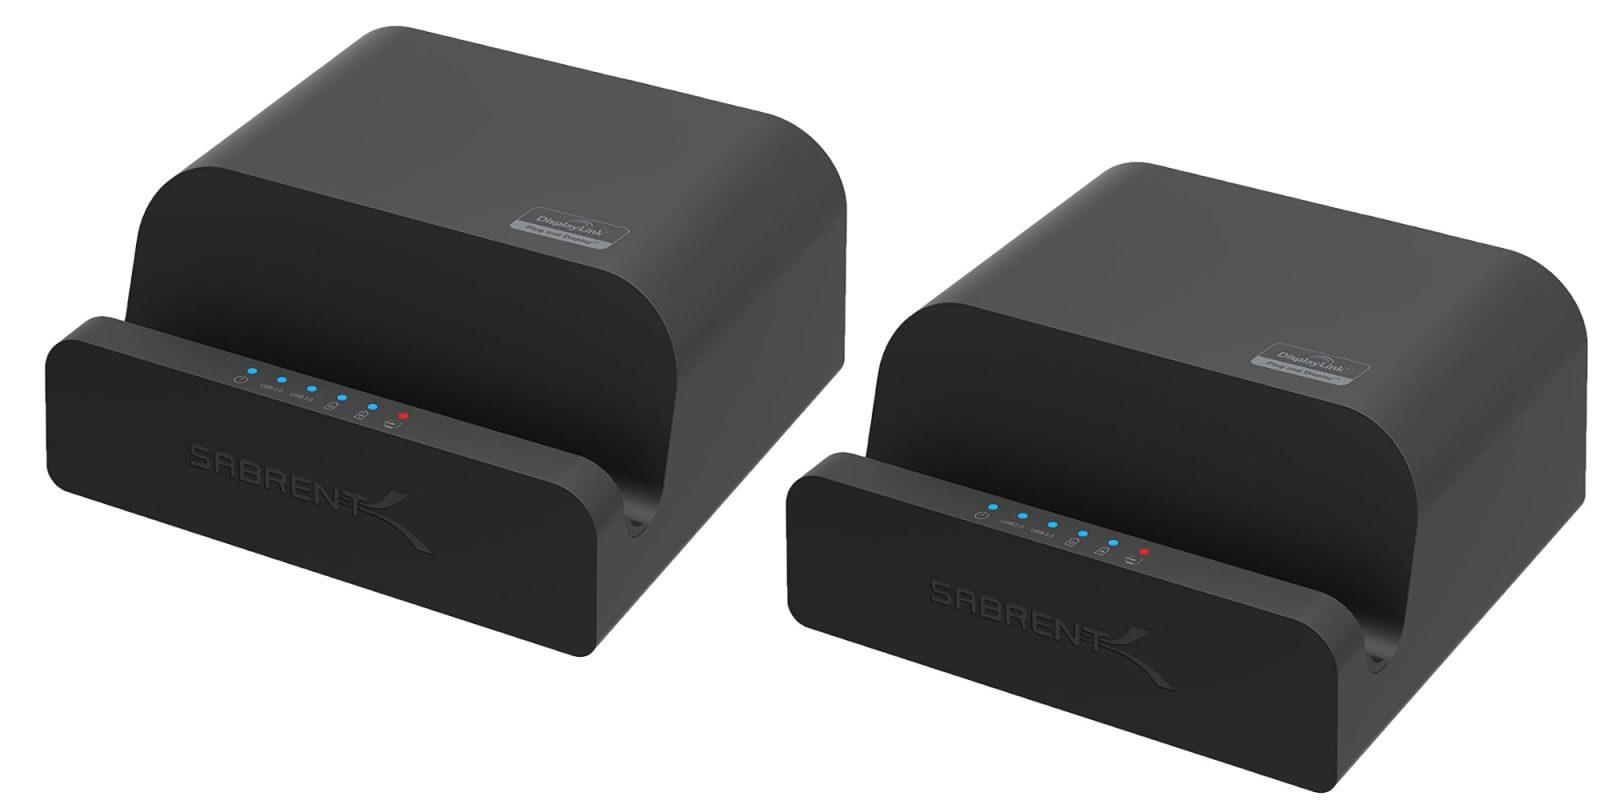 Sabrent's Universal Docking Station has HDMI, Ethernet, more: $49.50 (30% off)